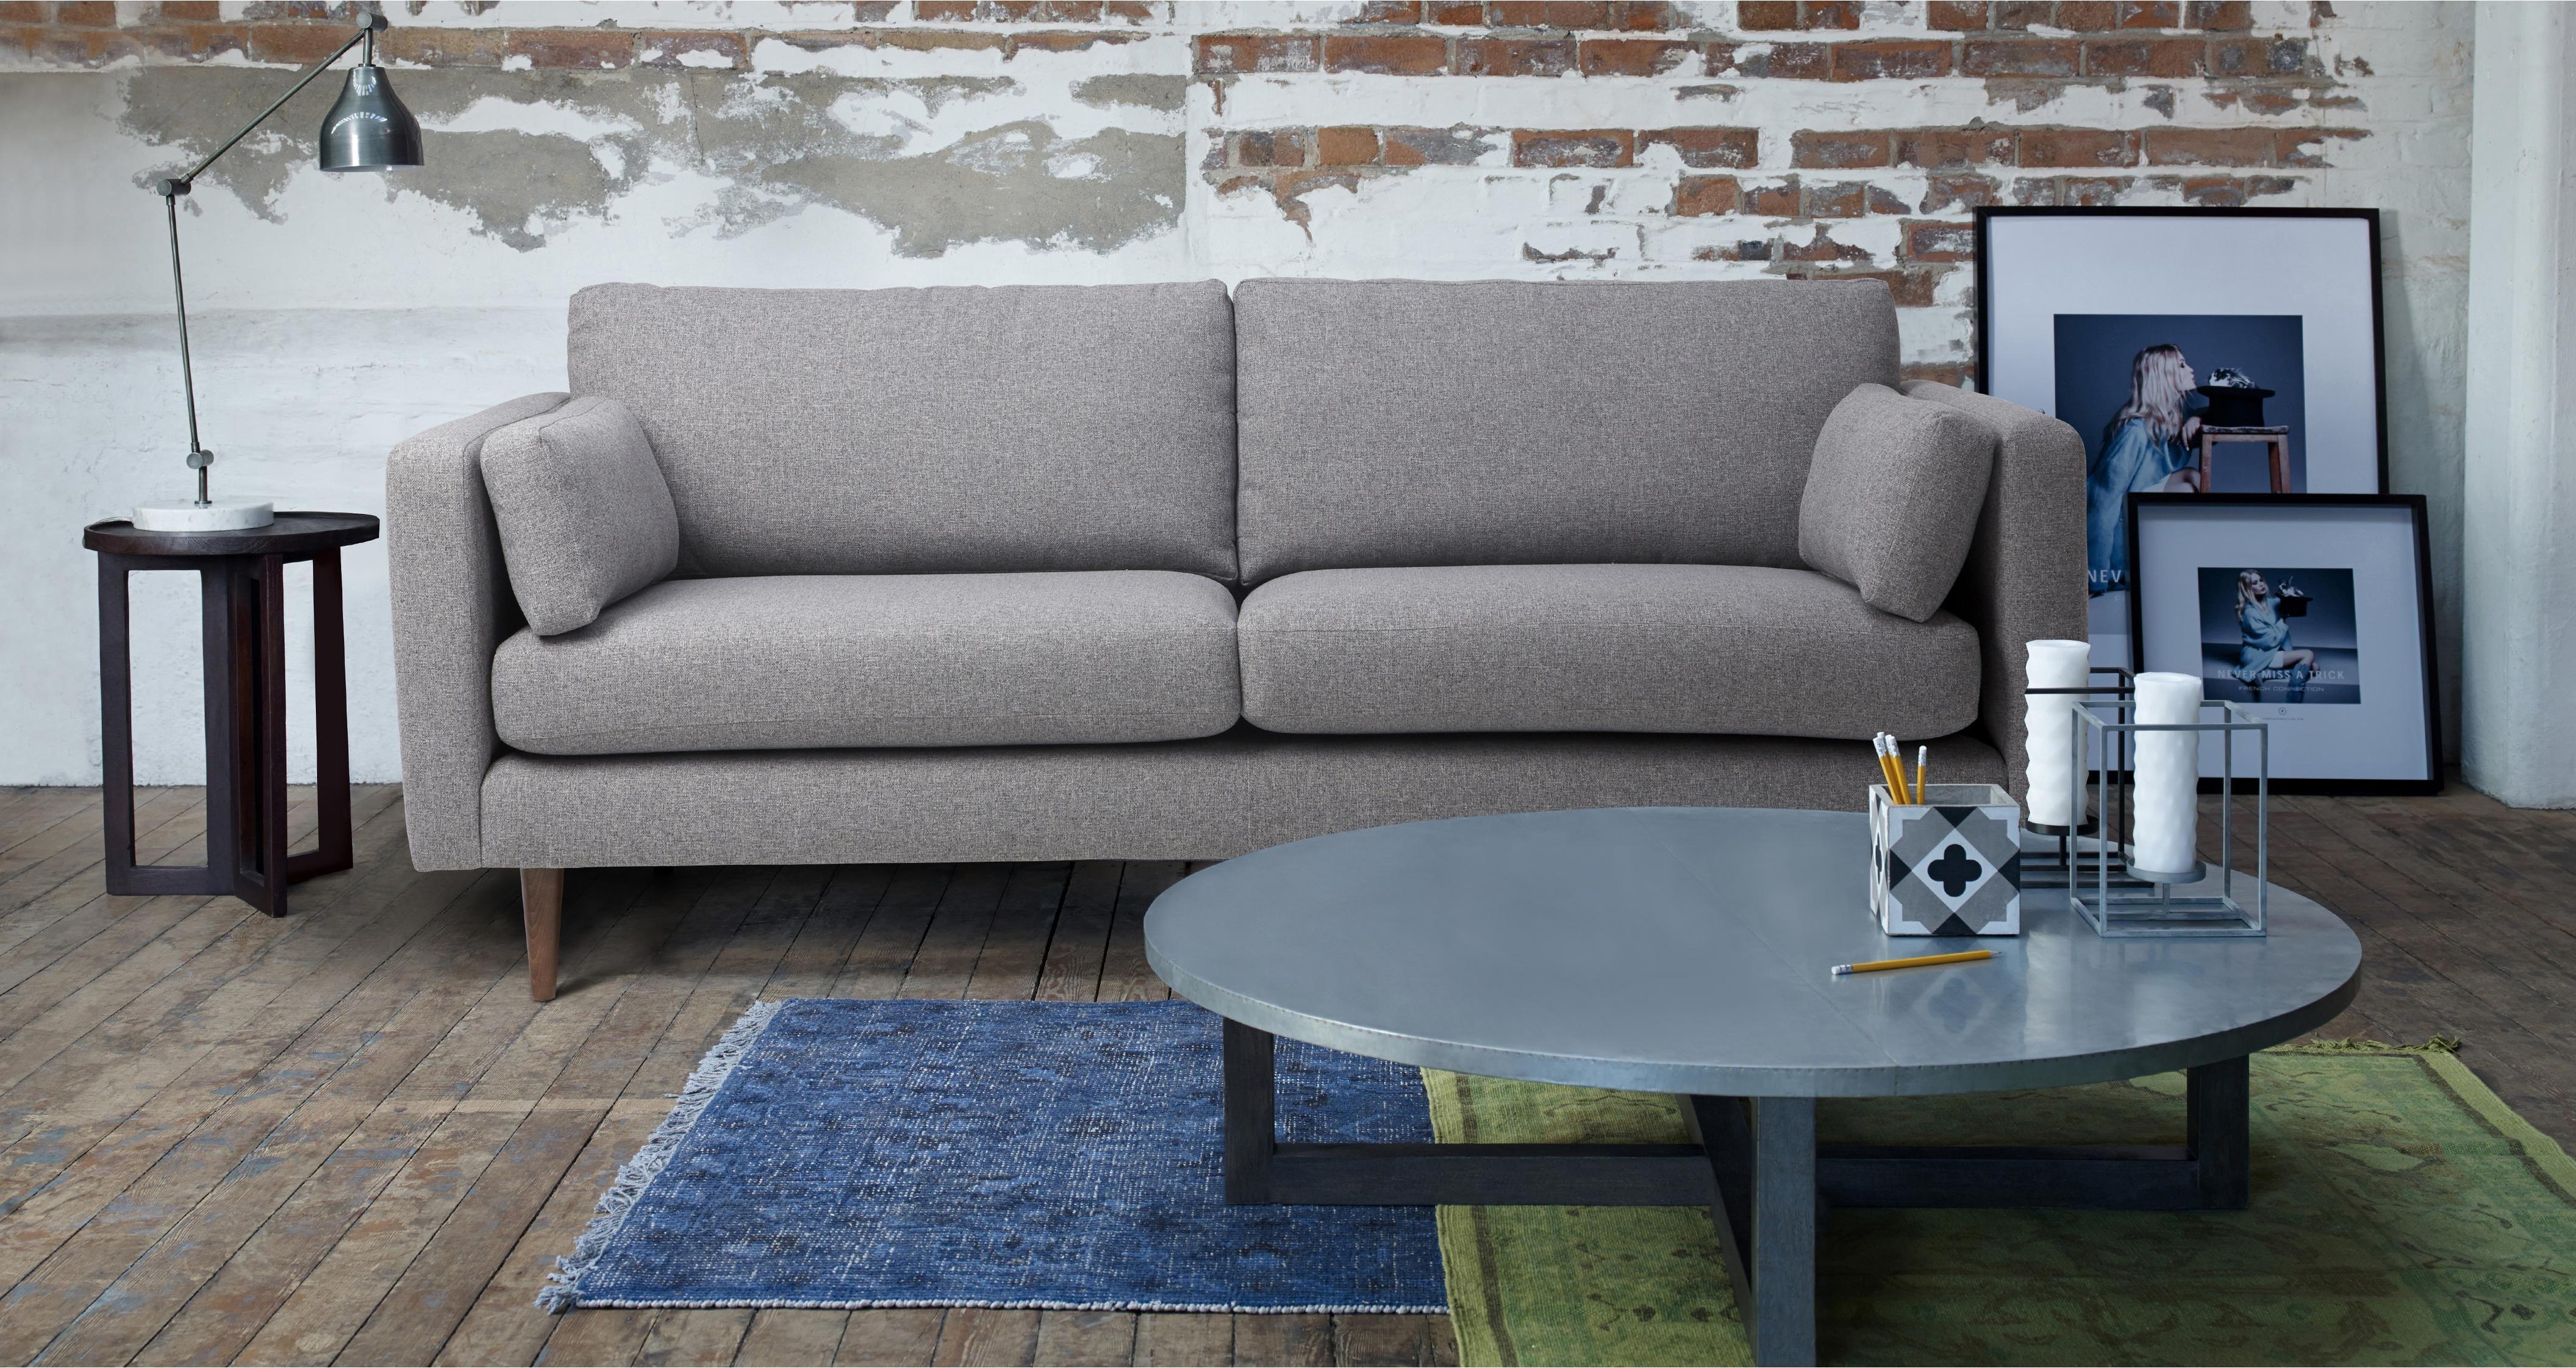 Marl Fabric 4 Seater Sofa Marl Plain Sofa Sale Sofa Furnishings